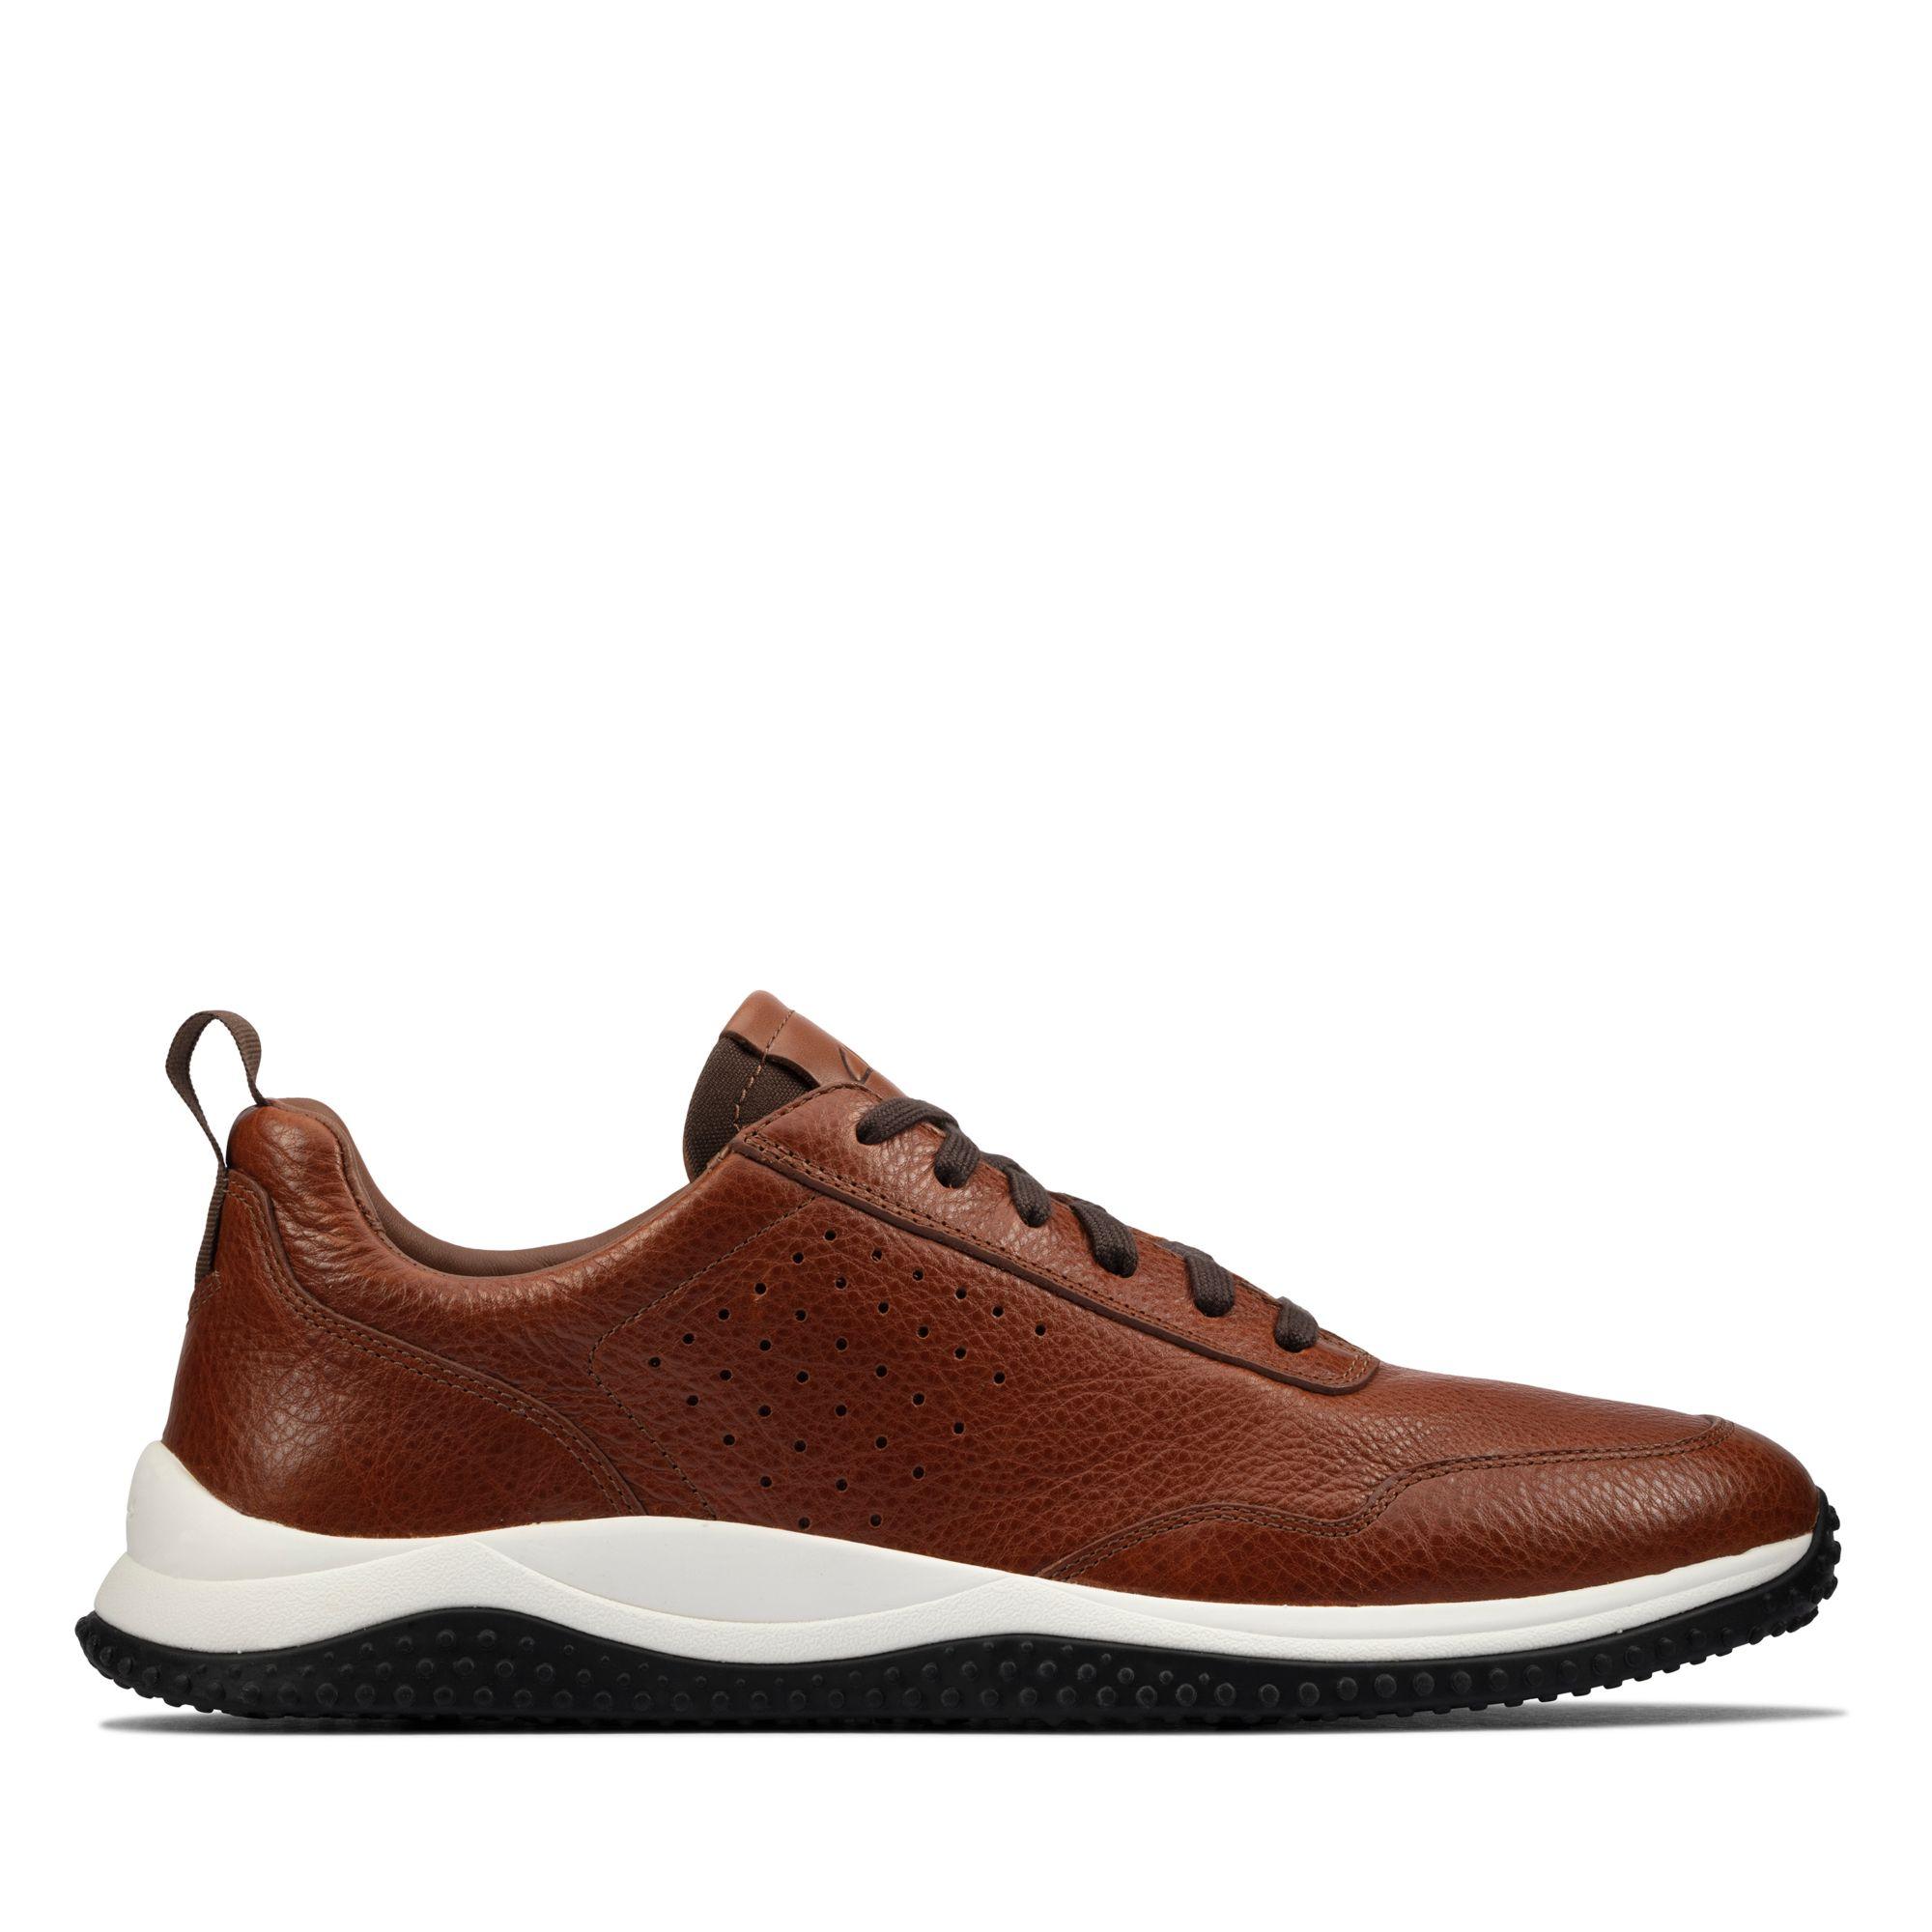 Clarks型格煥新-Puxton Lace 全真皮透氣綁帶休閒鞋(棕褐色)